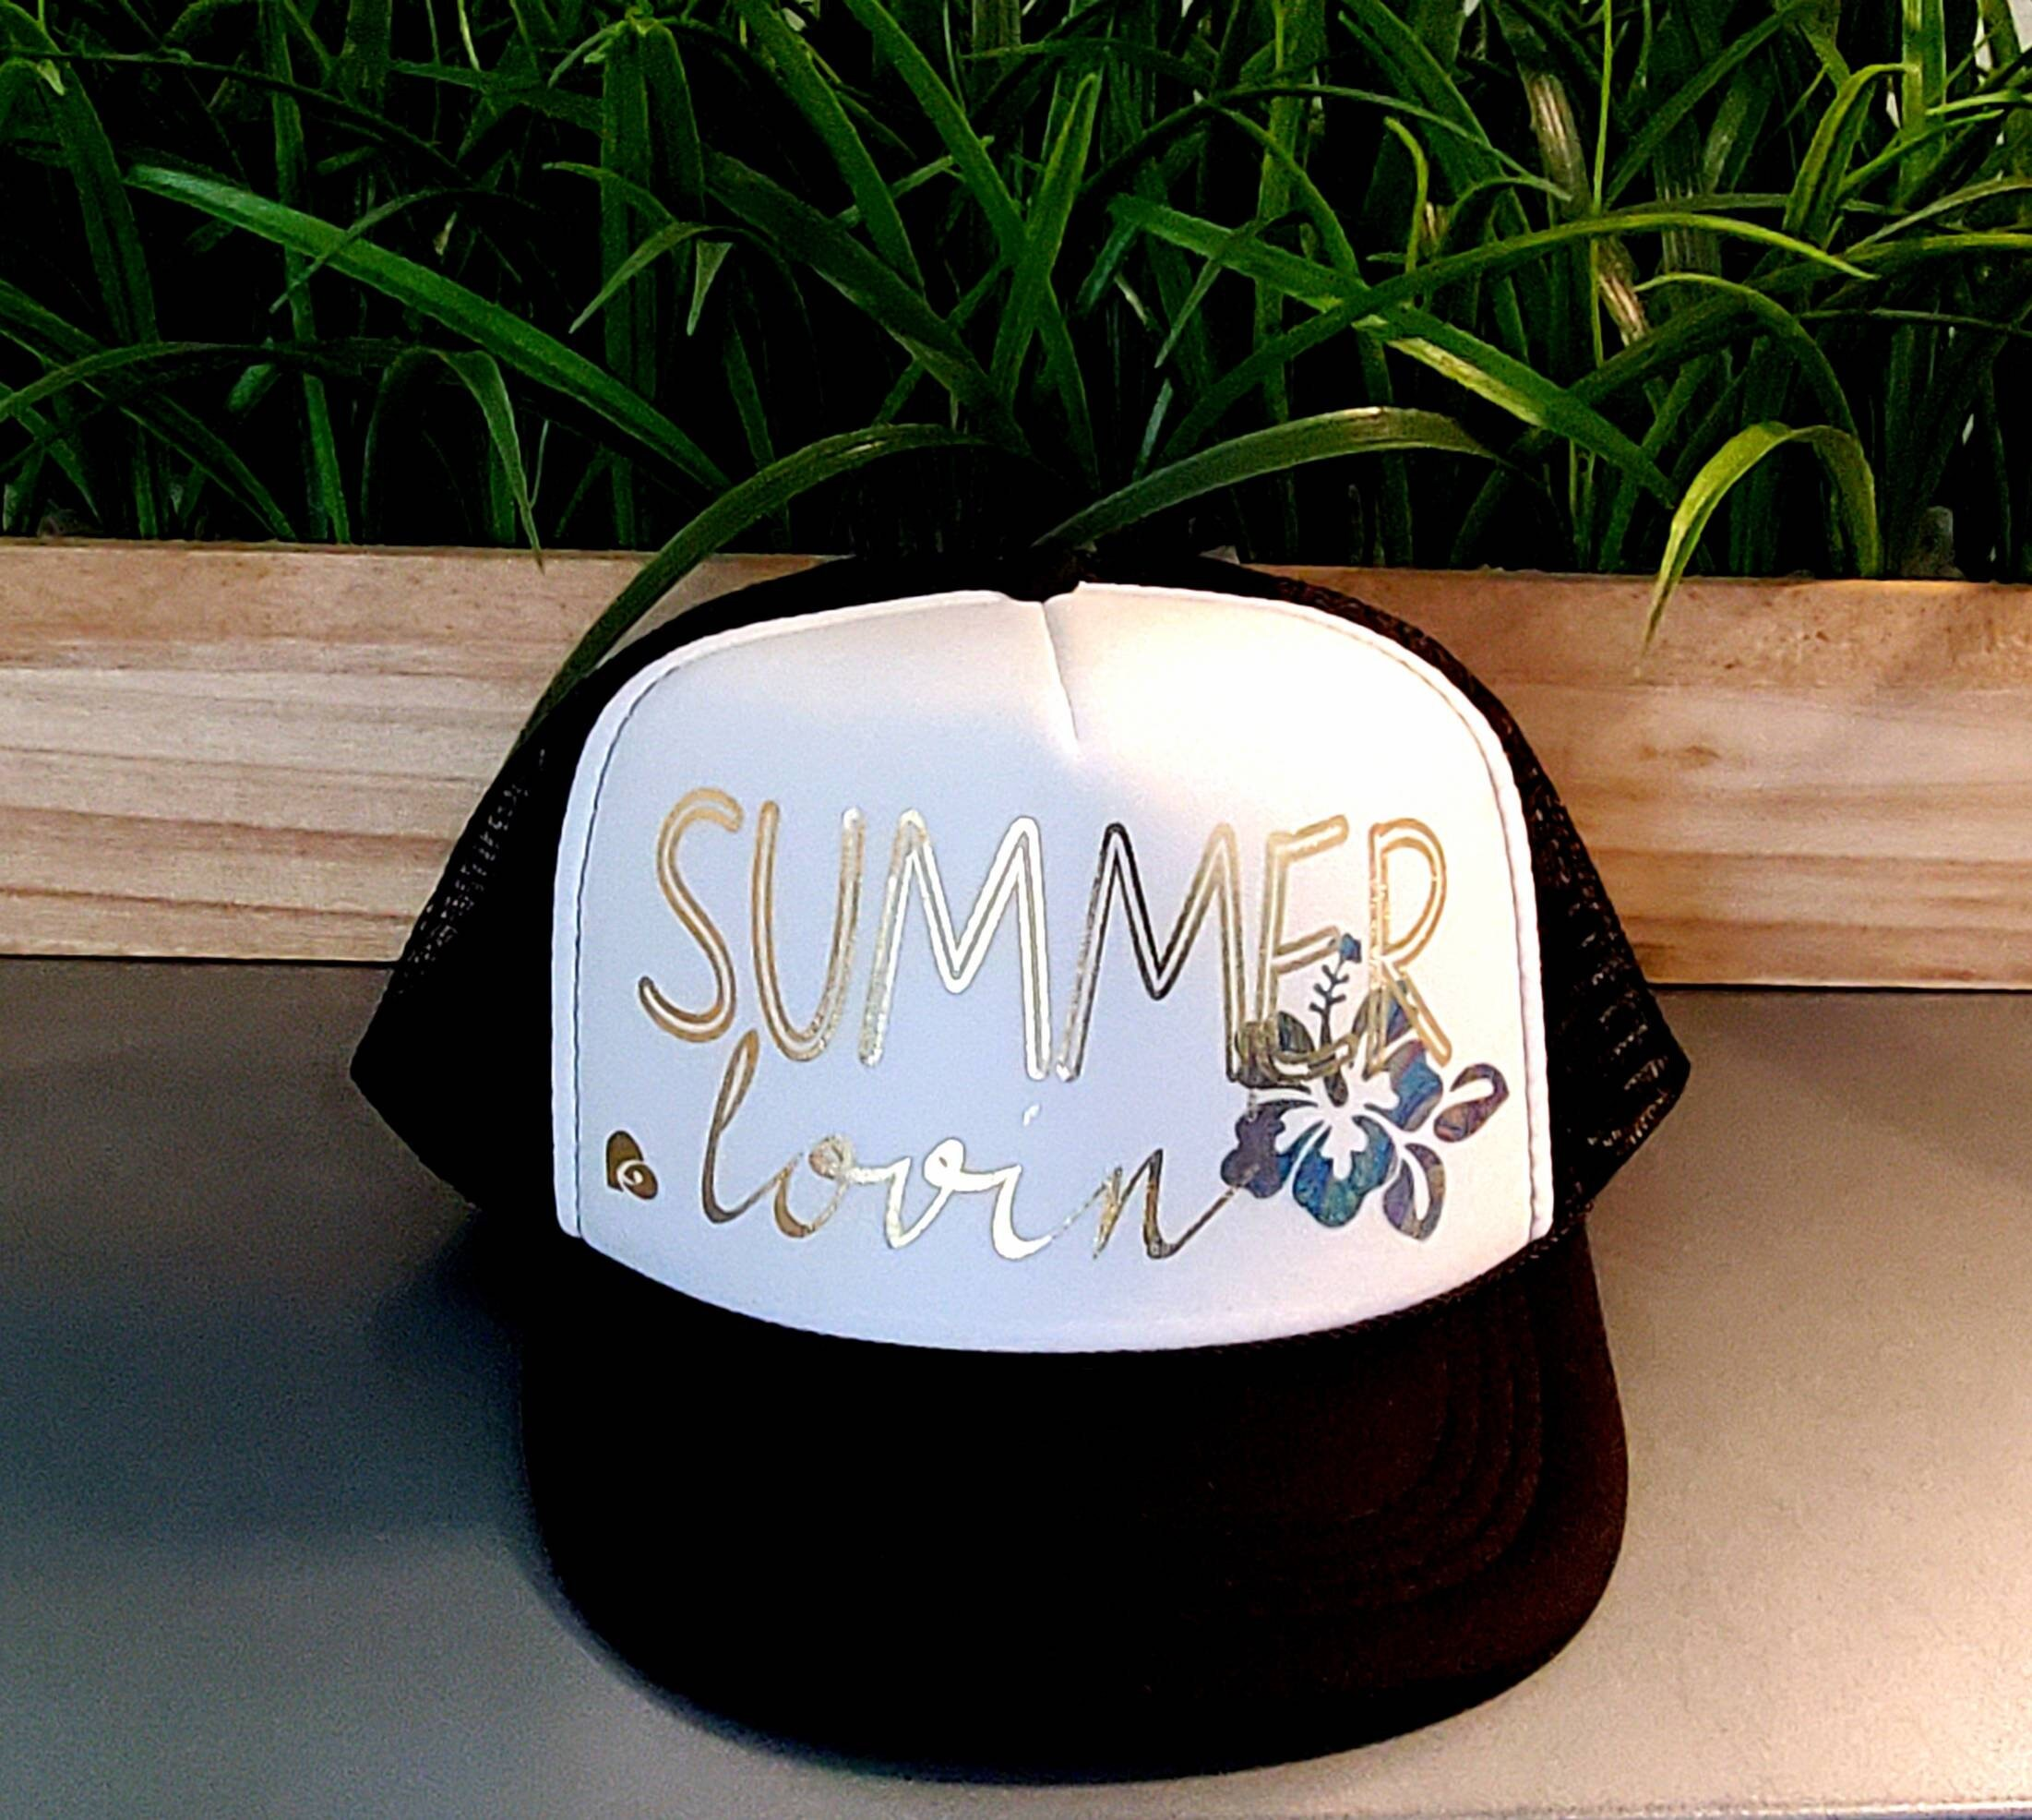 3aaf23a59 Summer Lovin Trucker Hat, Summer Vibes, Beach Trucker Hat, Beach, Summer,  Snapback Trucker Hat, Vacation, Beach, Party, Bachelorette,